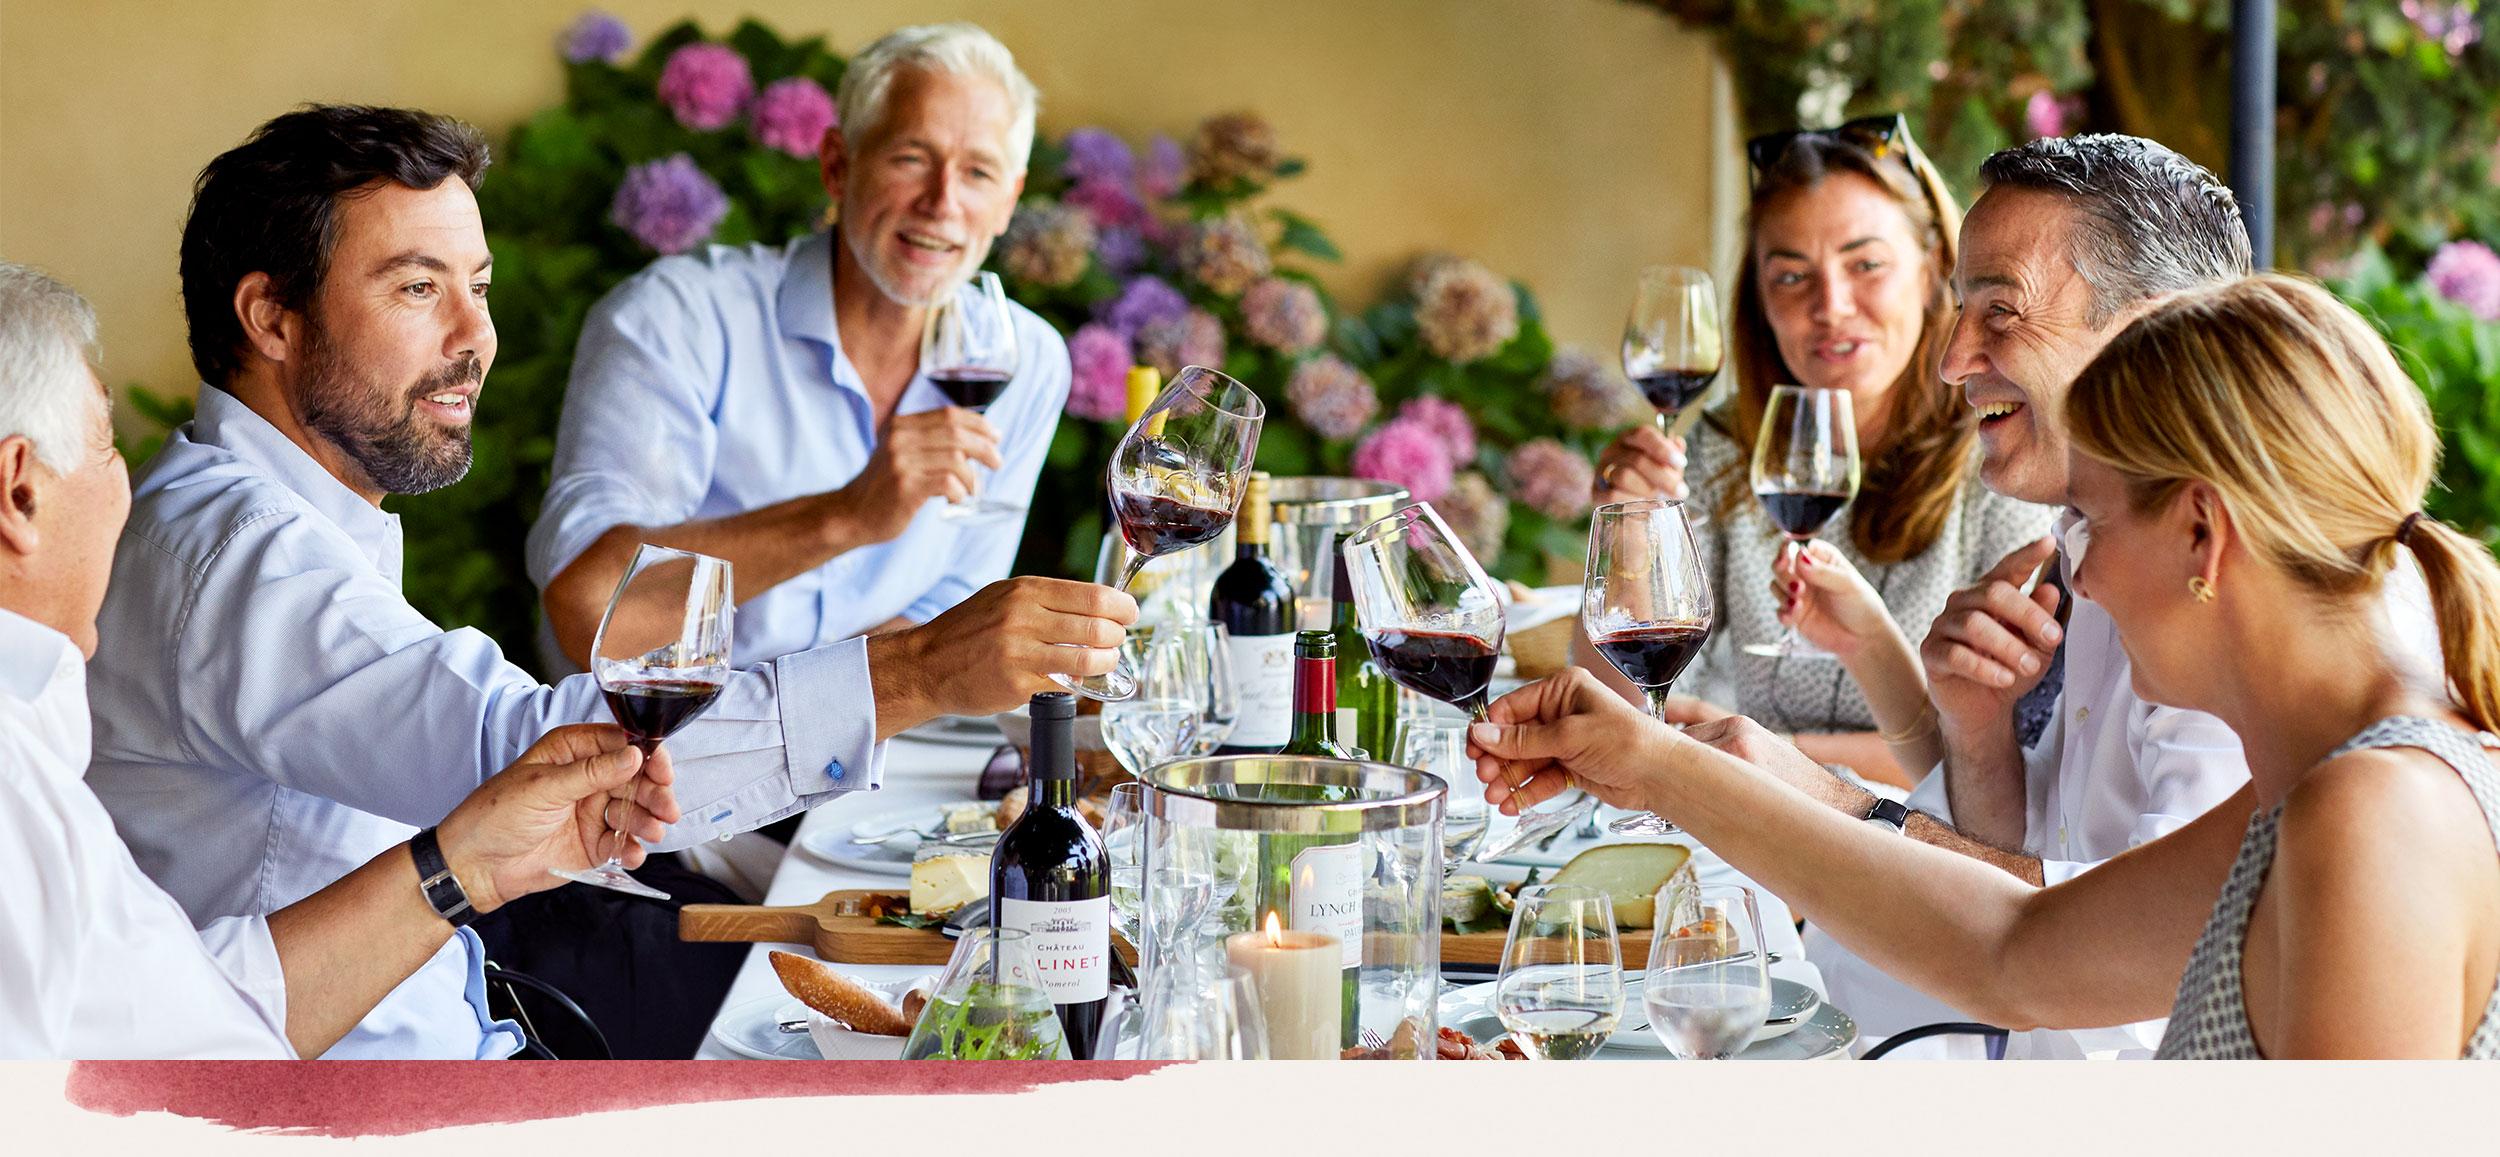 Enjoying the company of the VINIV winemaking community